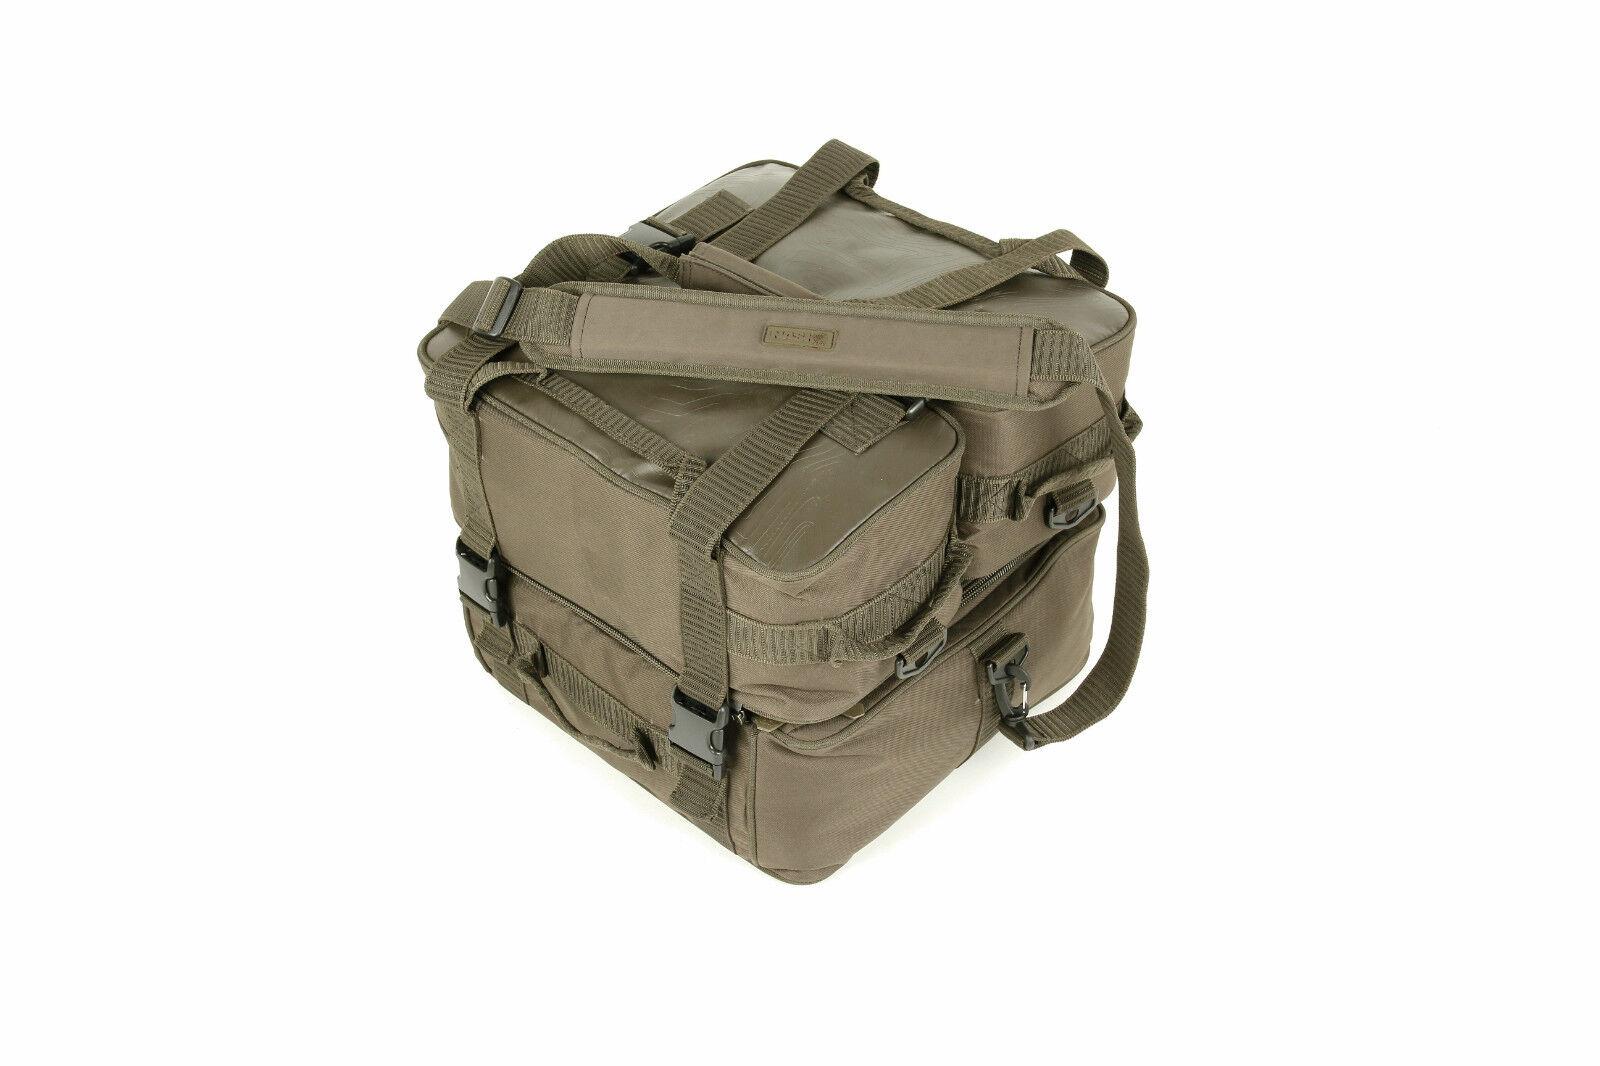 Nash Cube Tasche Bag Carryall  Angeltasche Taschensystem Bagsystem Anglertasche  lightning delivery